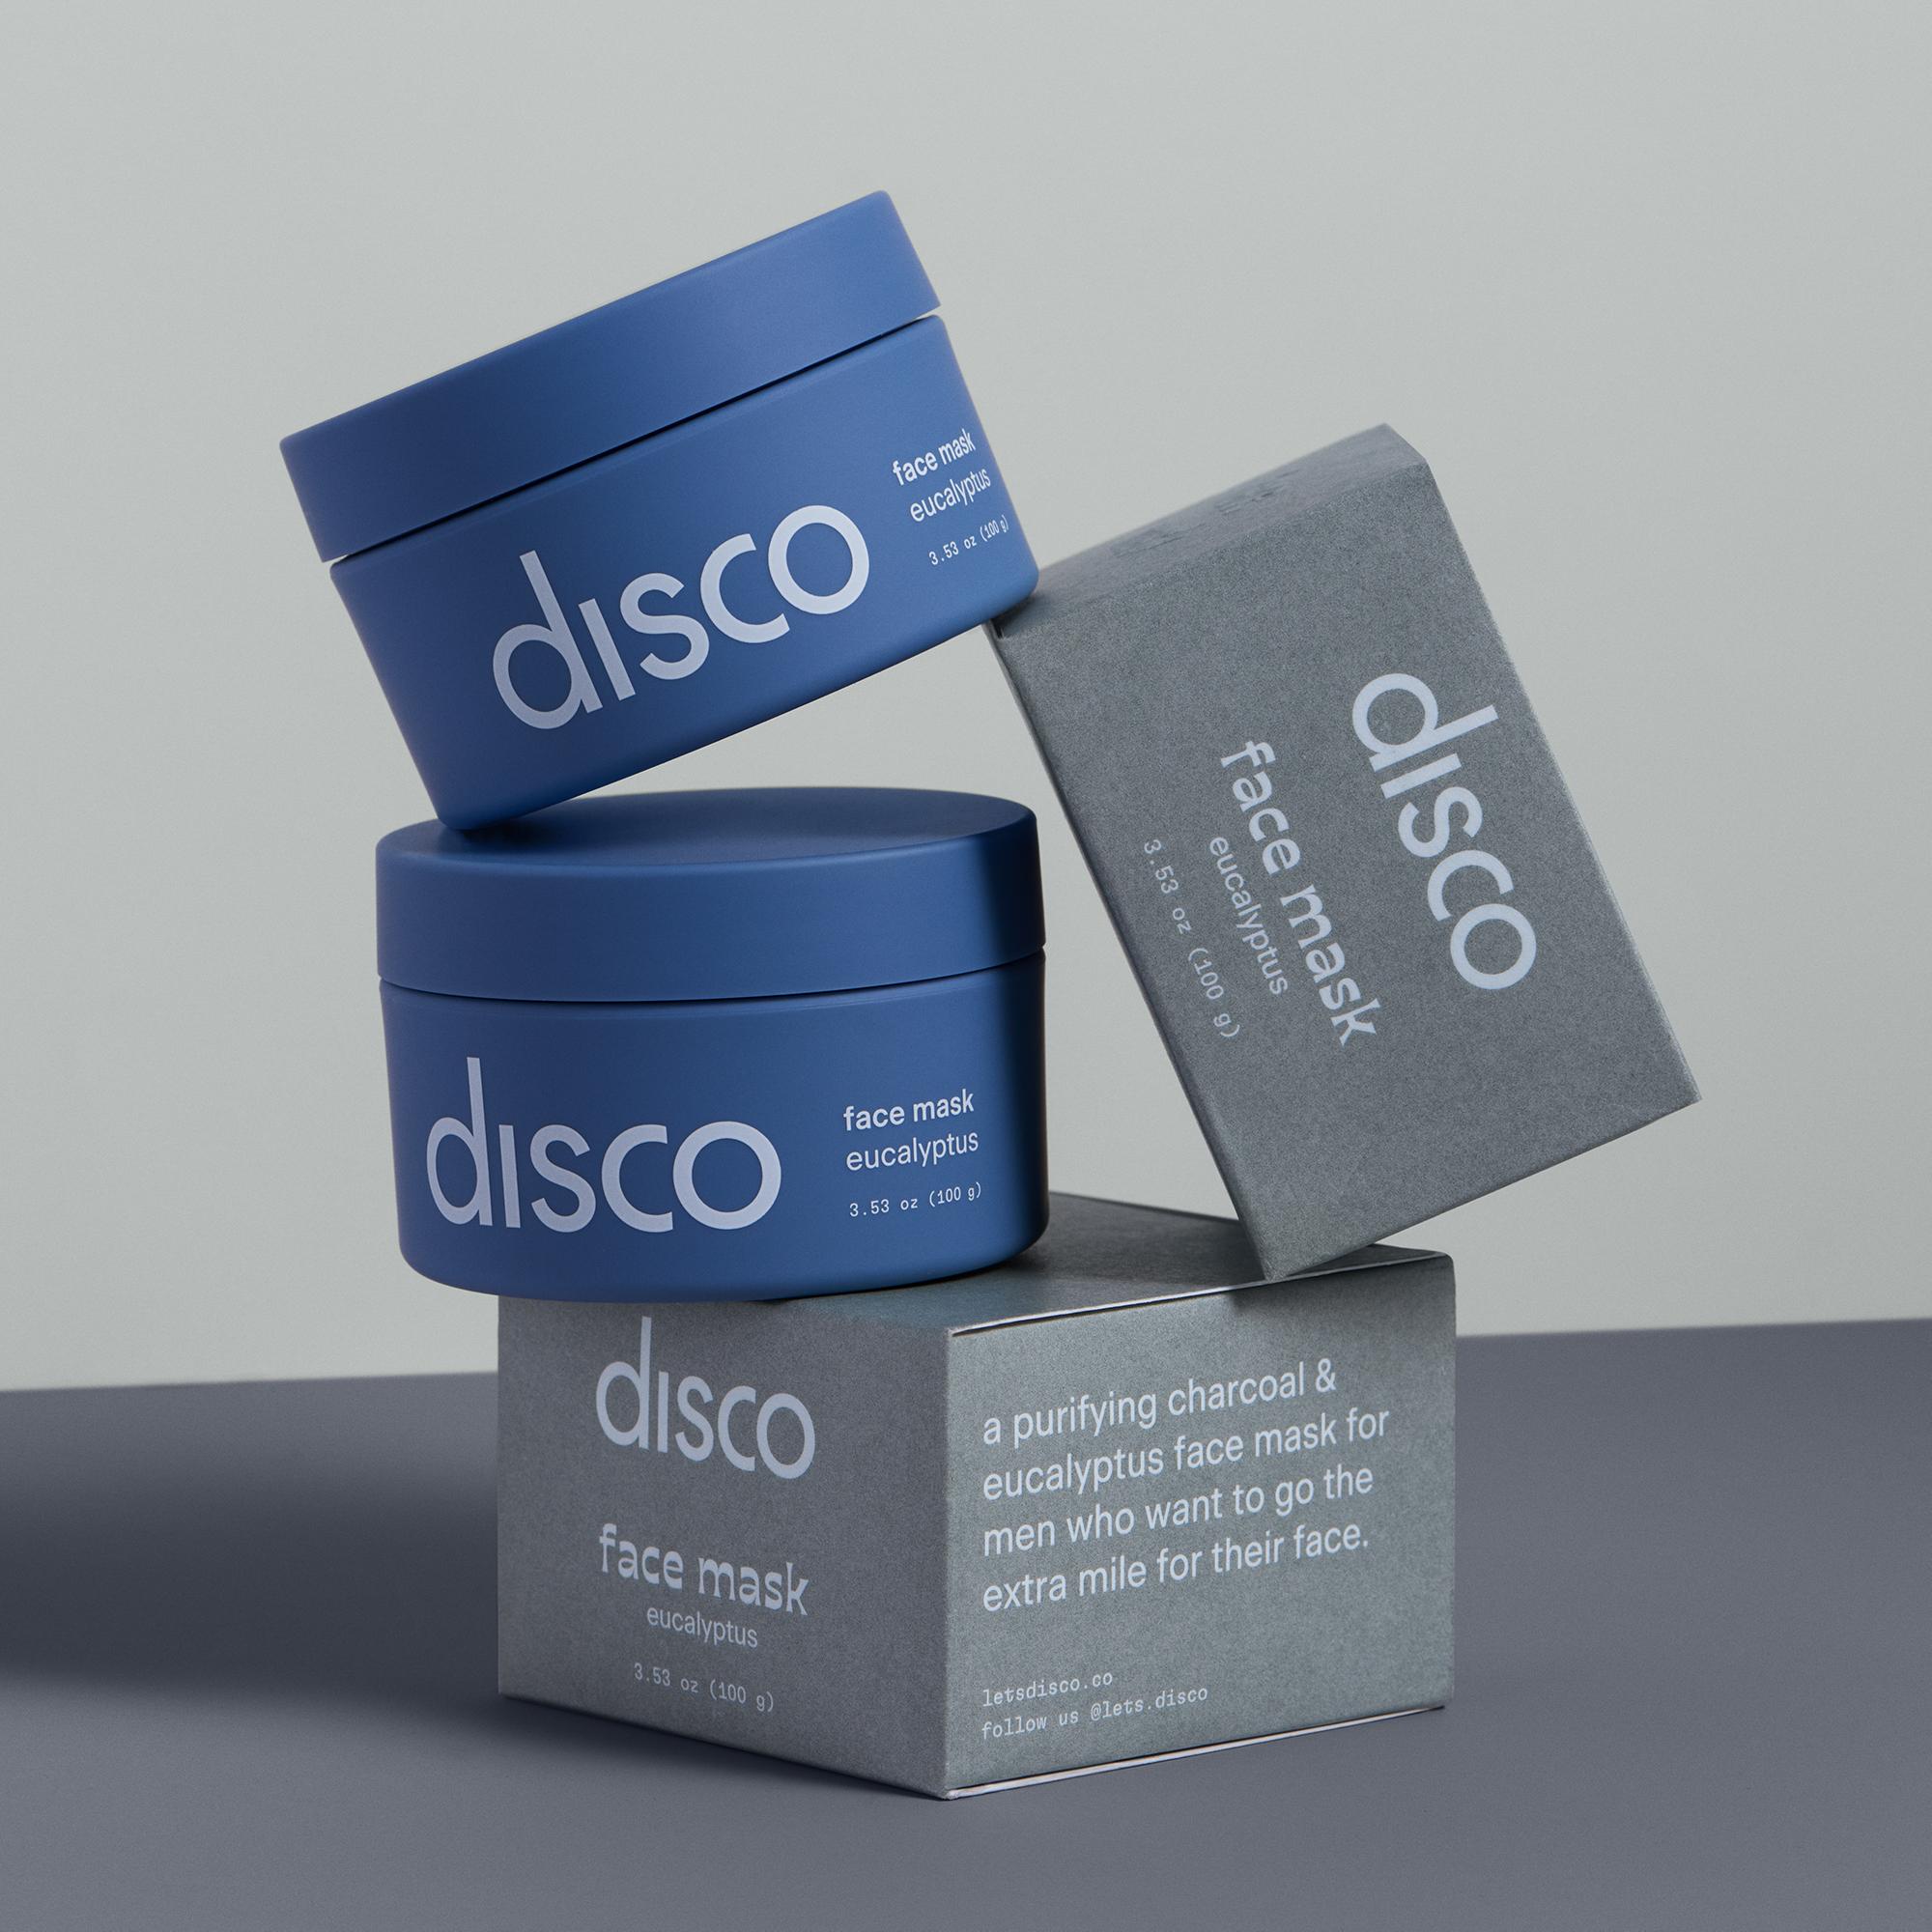 Disco-product12422